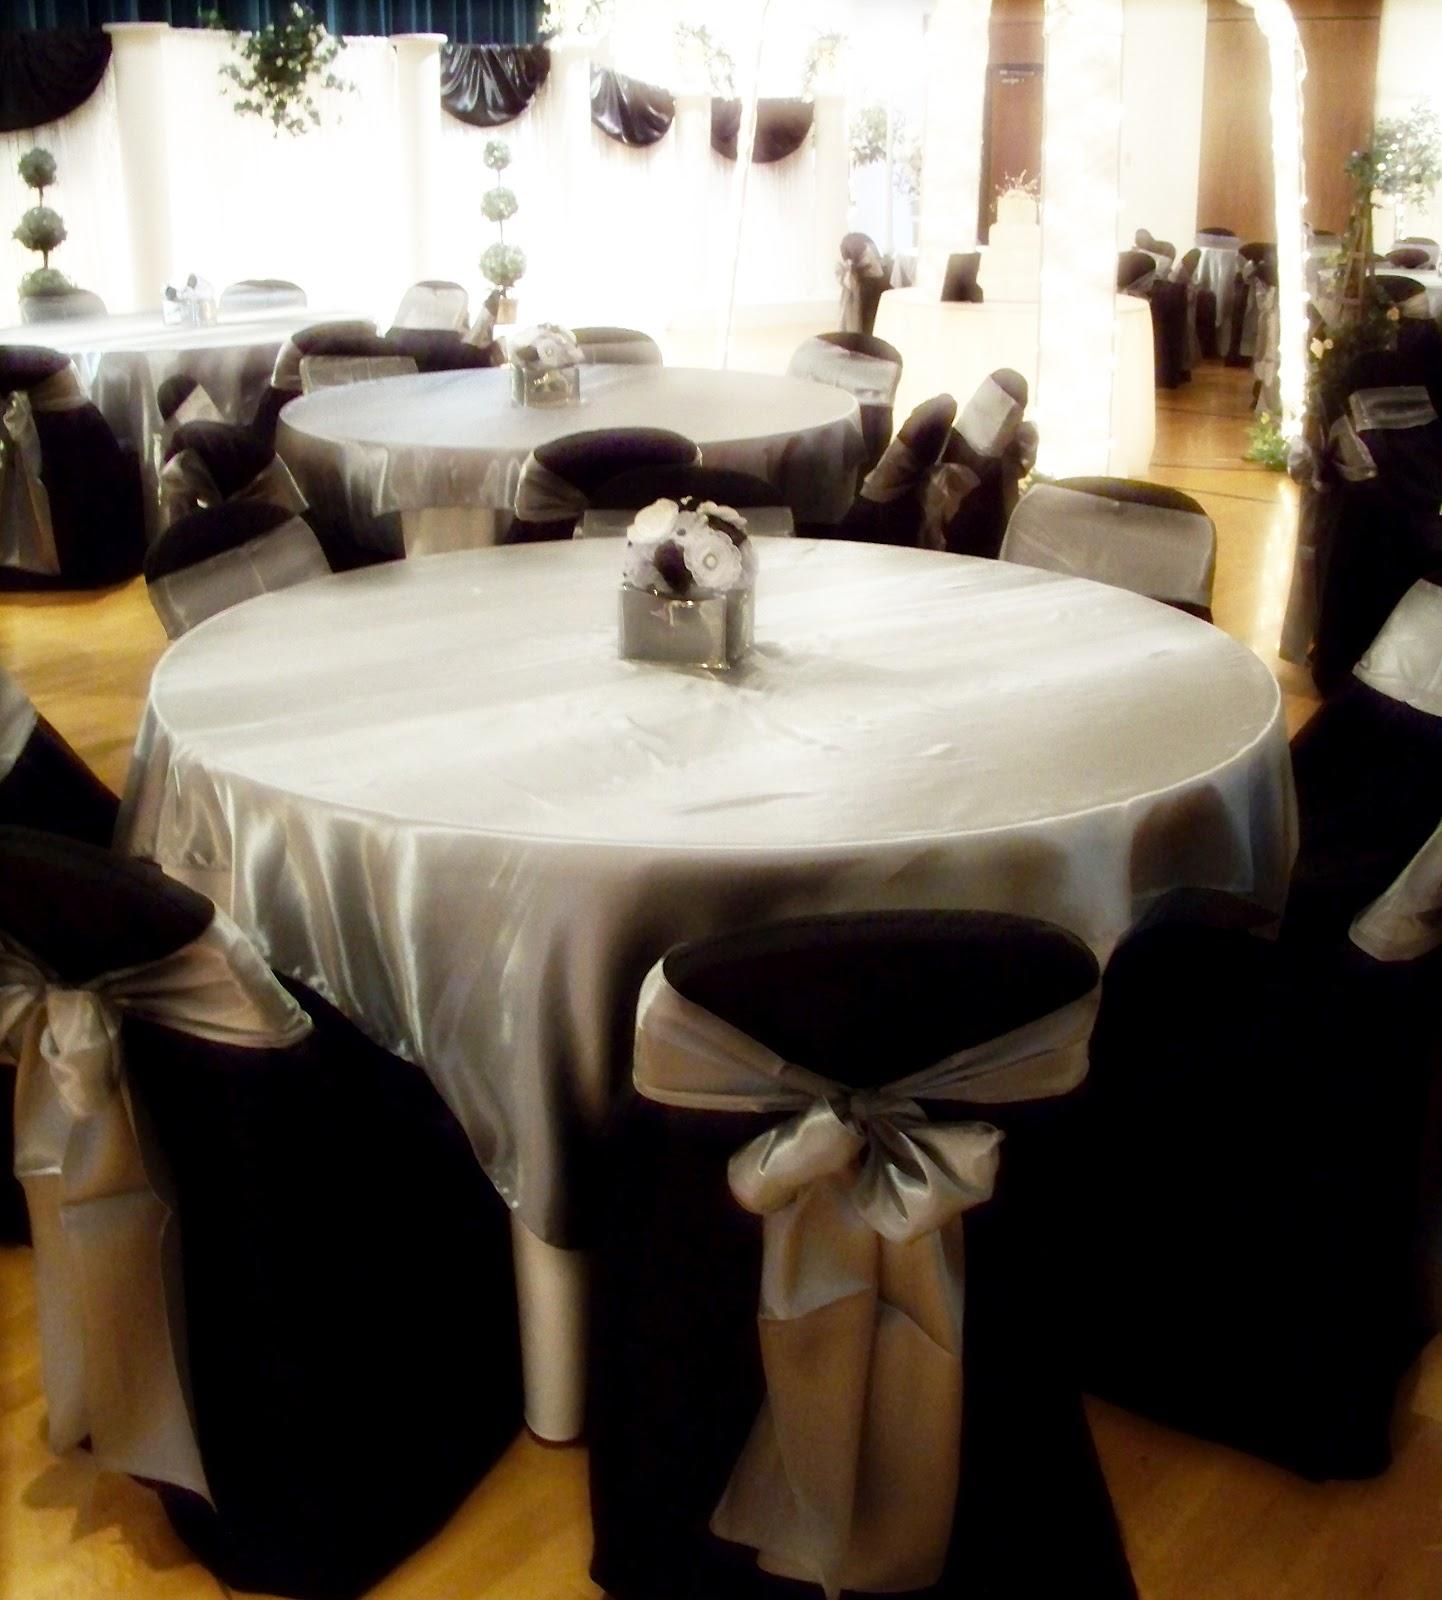 Silver Wedding Decorations: Runaway Bridal Planner: Black, White And Silver Wedding